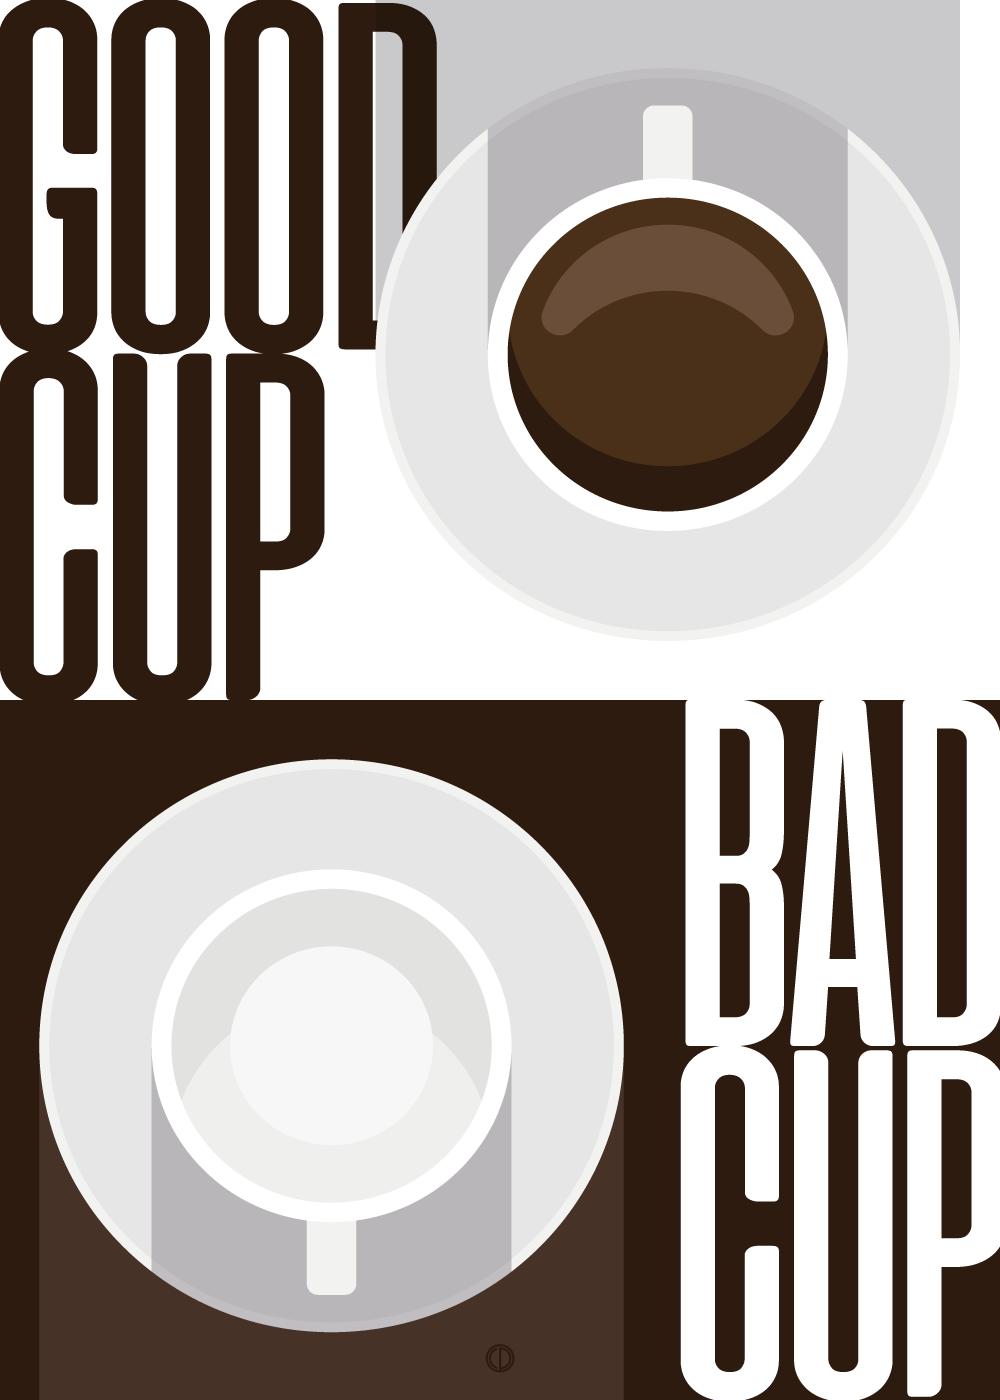 Good cup bad cup - Kaffe plakat